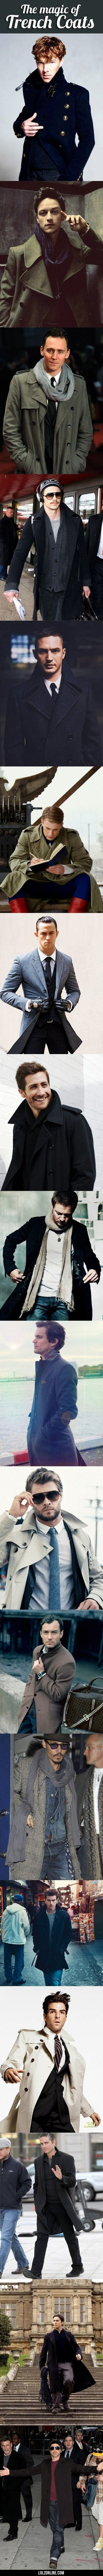 Trench Coats Can Do Wonders #lol #haha #funny